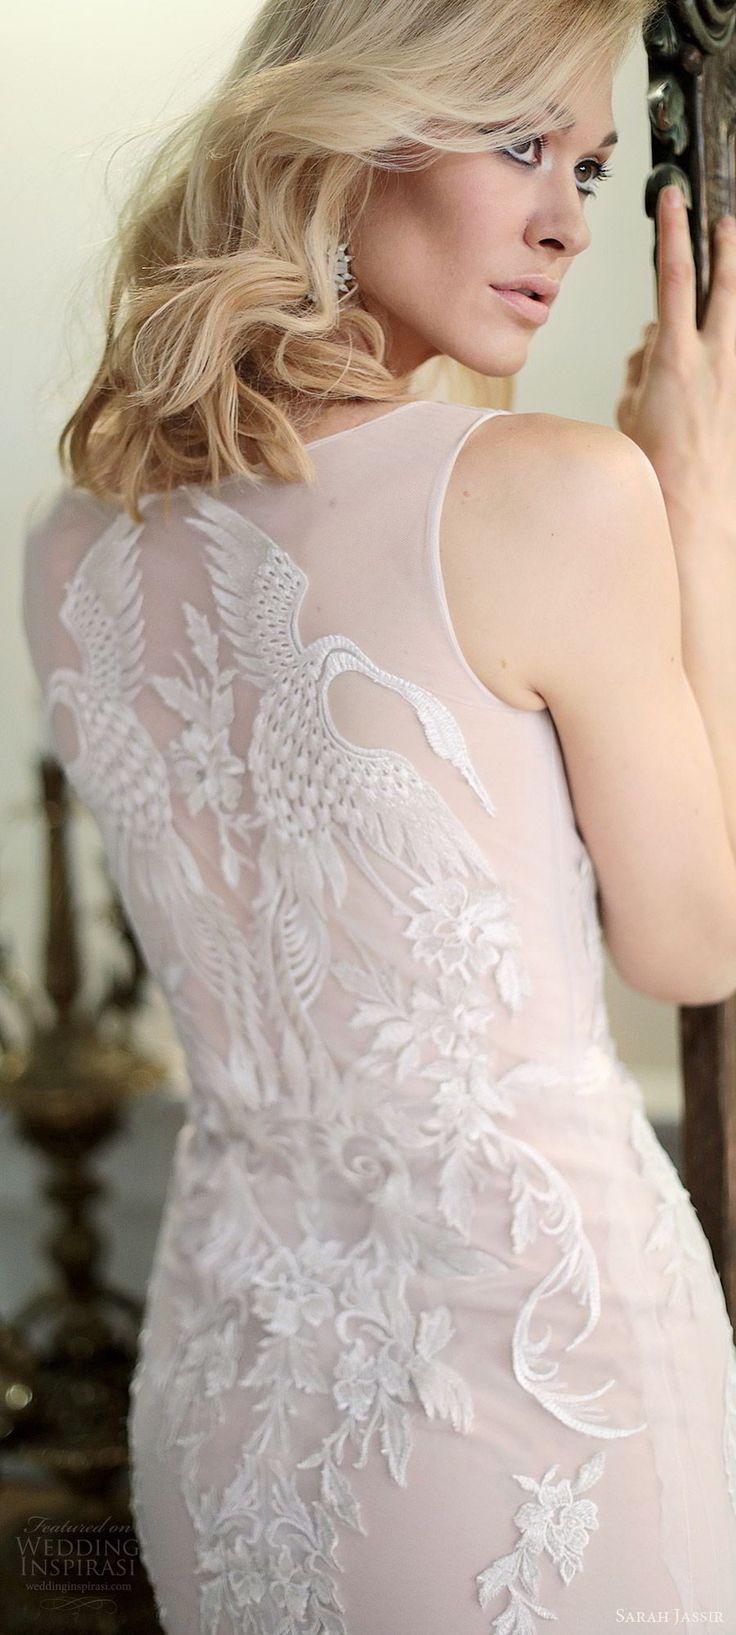 sarah jassir bridal 2018 sleeveless illusion straps sweetheart heavily embellished lace sheath wedding dress (swan) zbv blush sweep train modern elegant -- Sarah Jassir 2018 Wedding Dresses